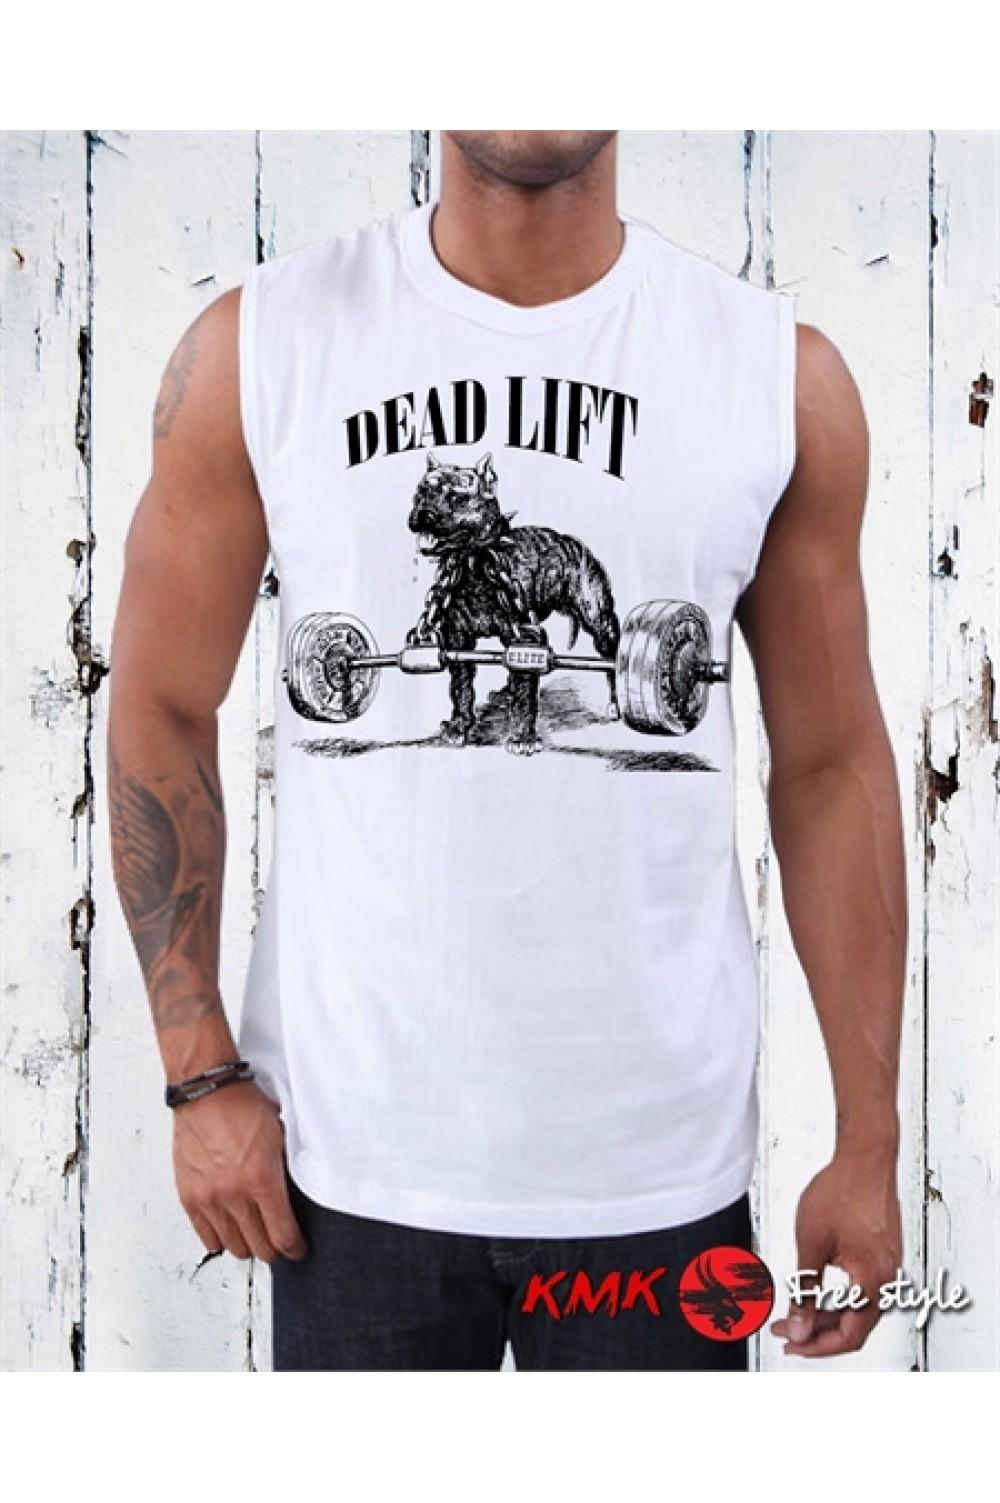 0ff8c46c16 Personal Trainer Printed T Shirts - DREAMWORKS